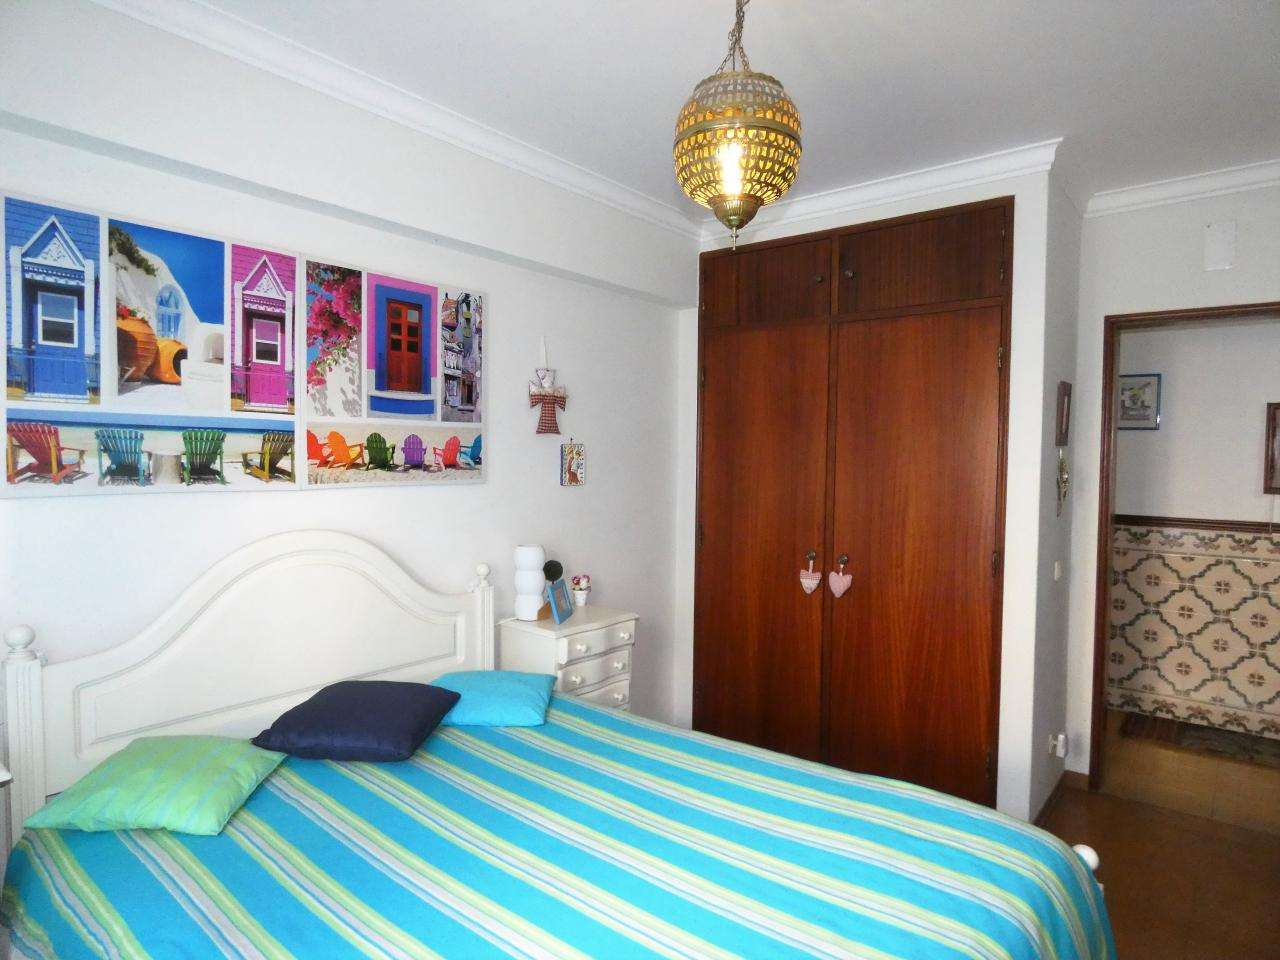 Apartamento para comprar, Ericeira, Mafra, Lisboa - Foto 13